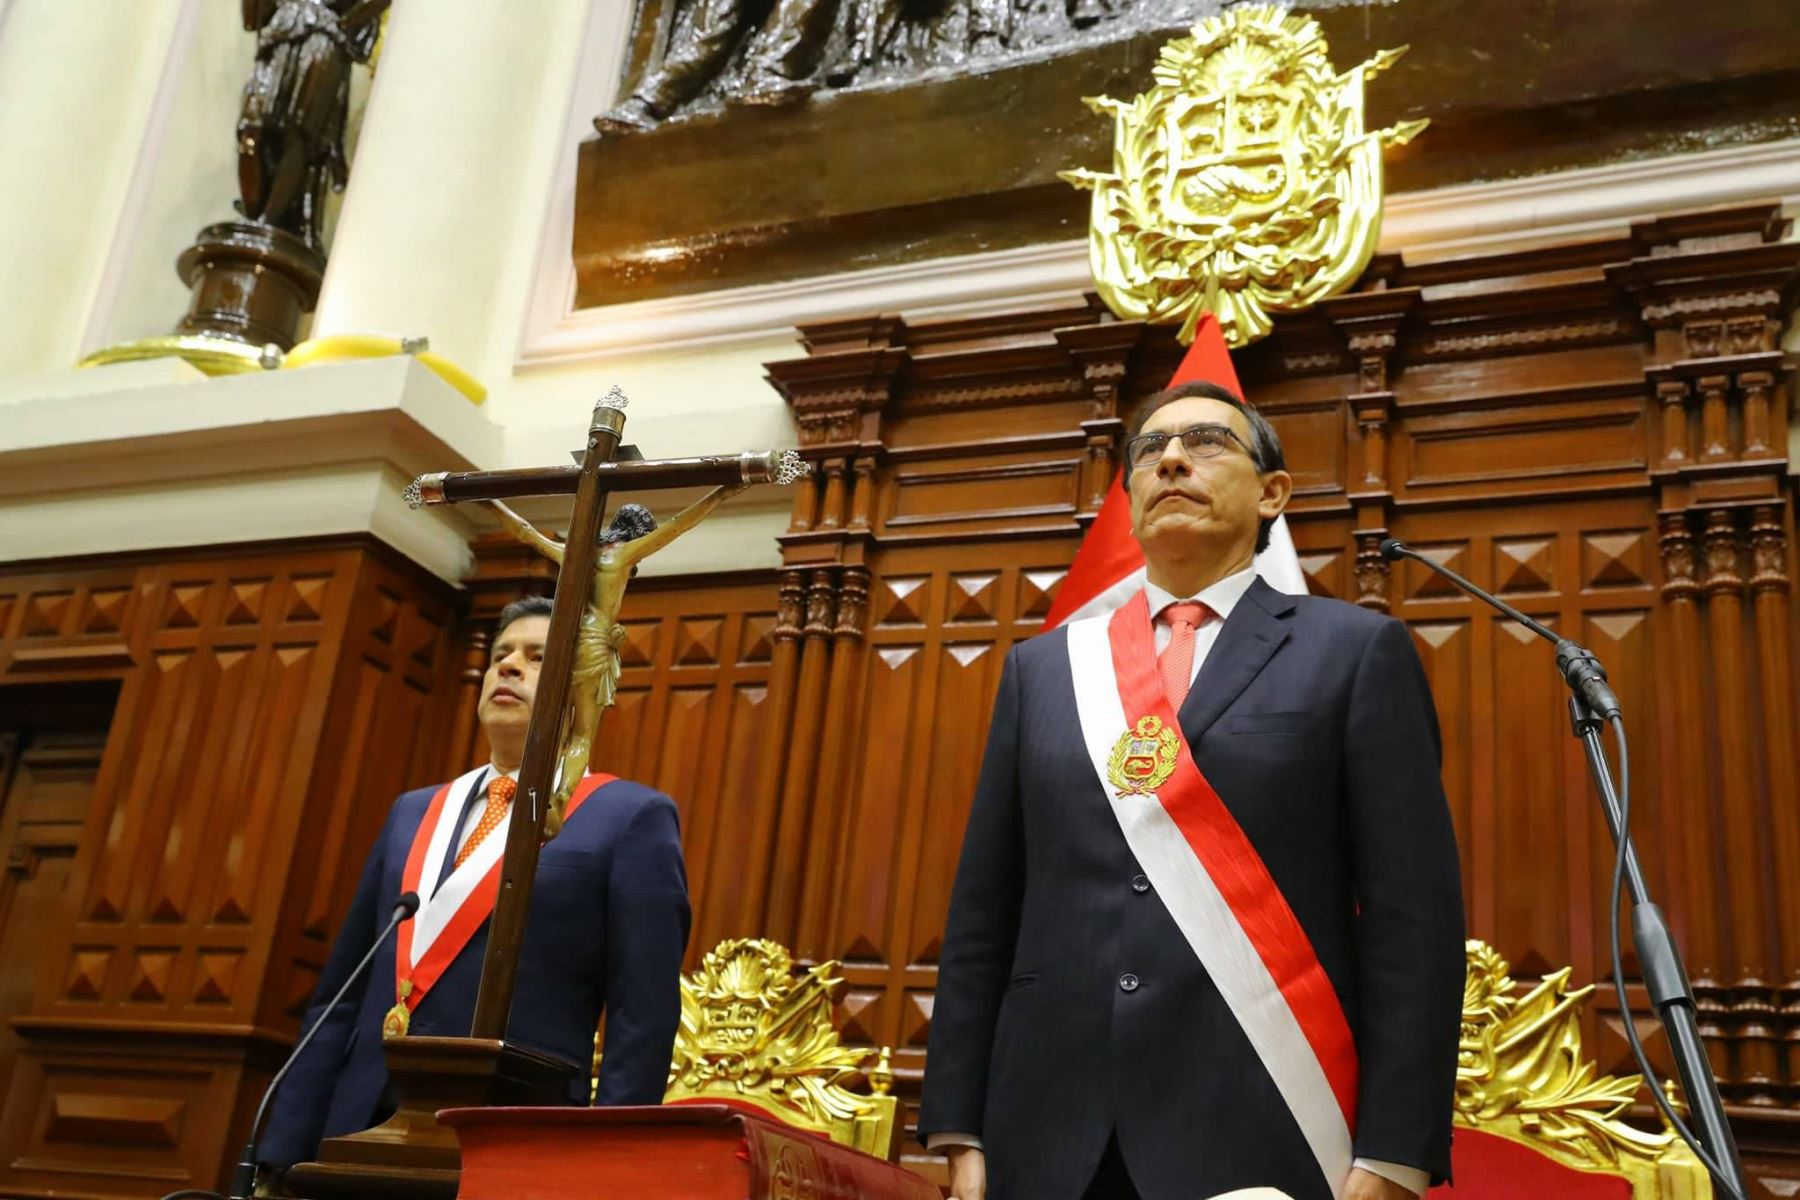 Fiscalía peruana pide impedimento de salida del país para Kuczynski